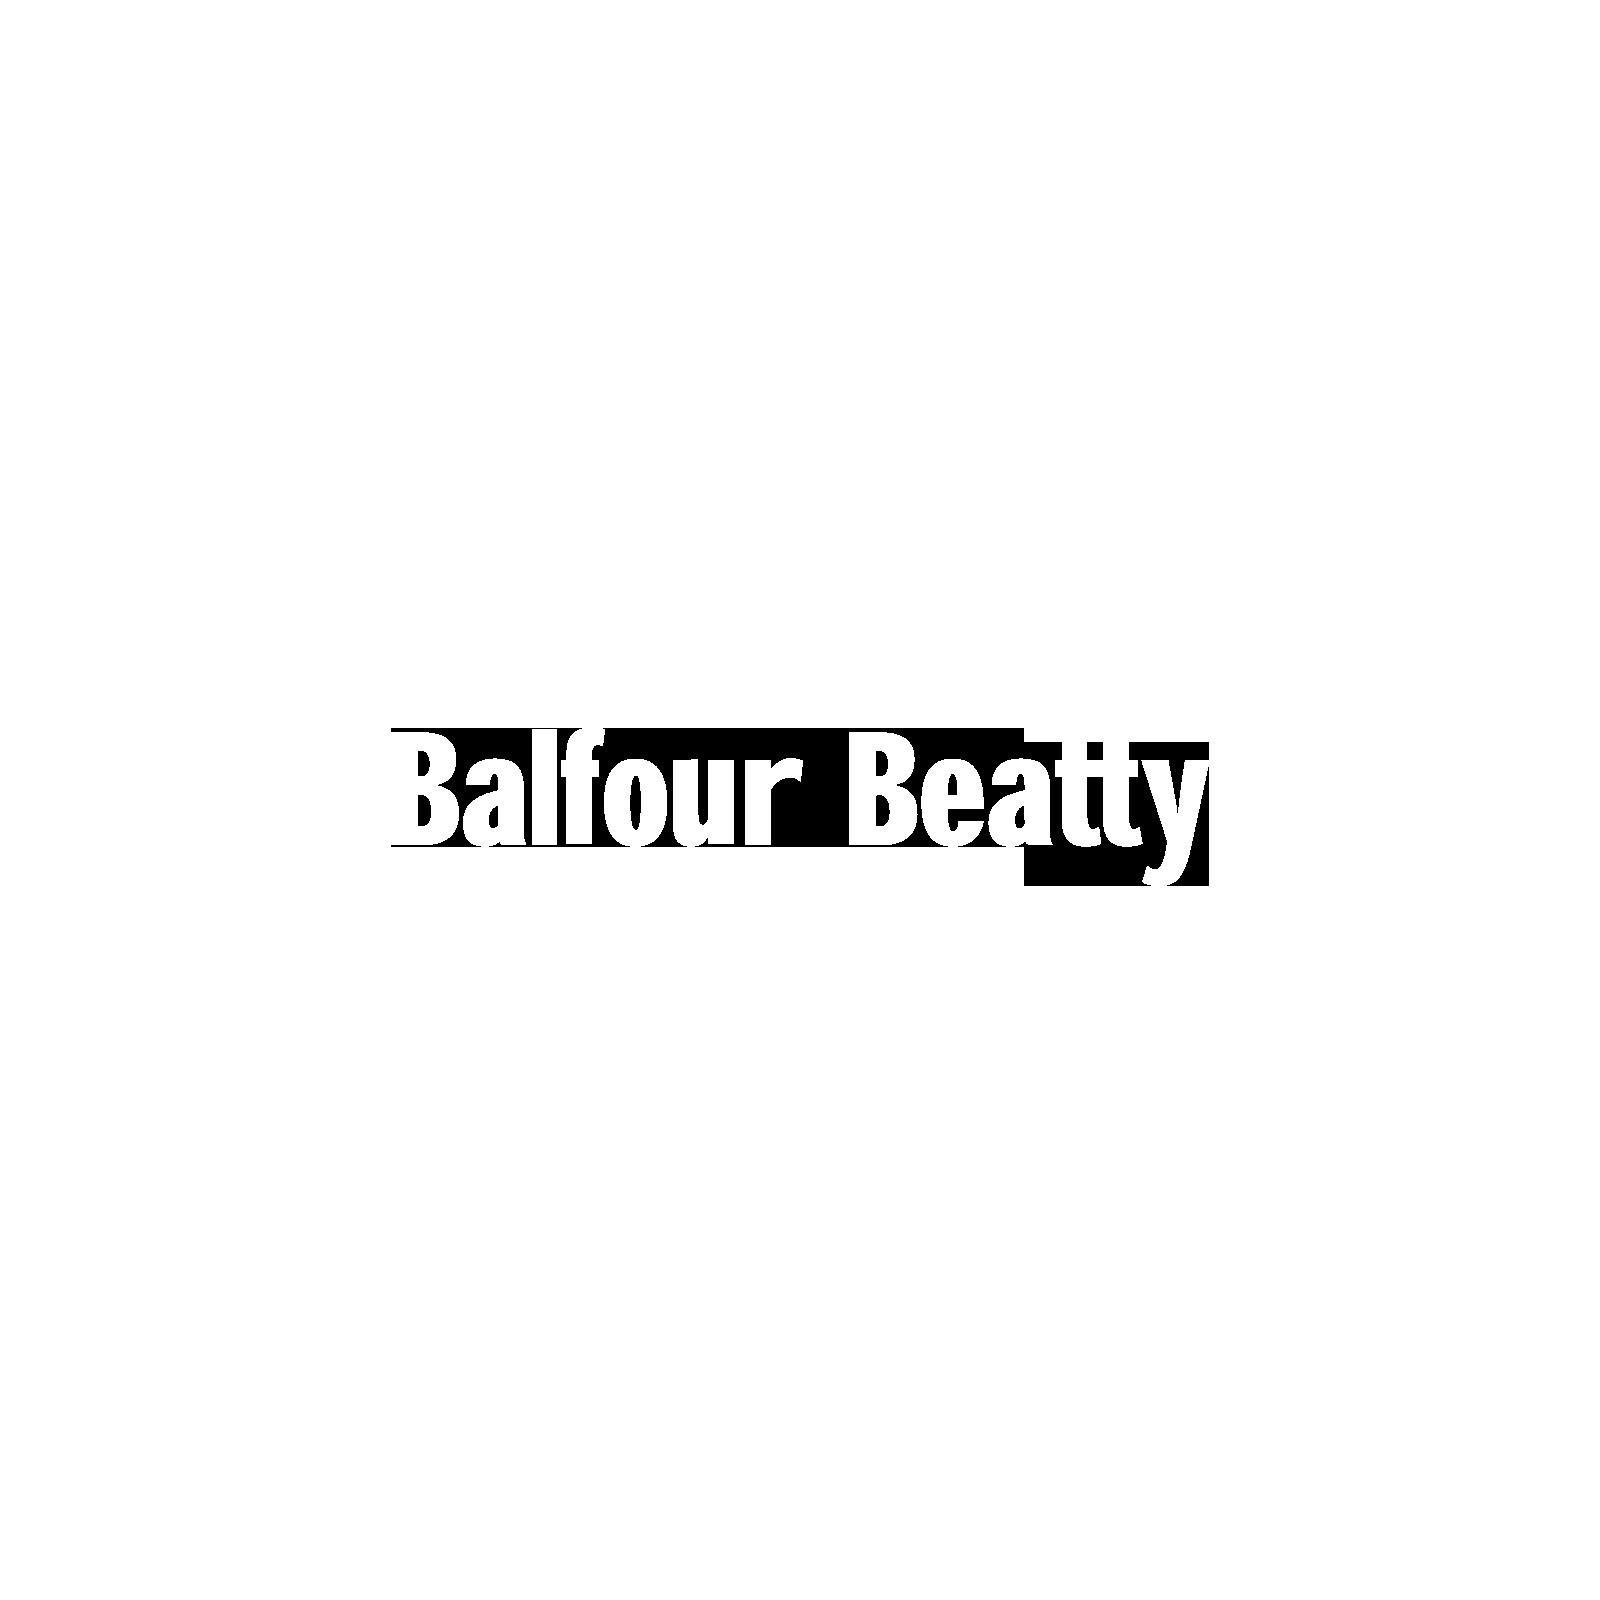 balfour-beatty-project-logo